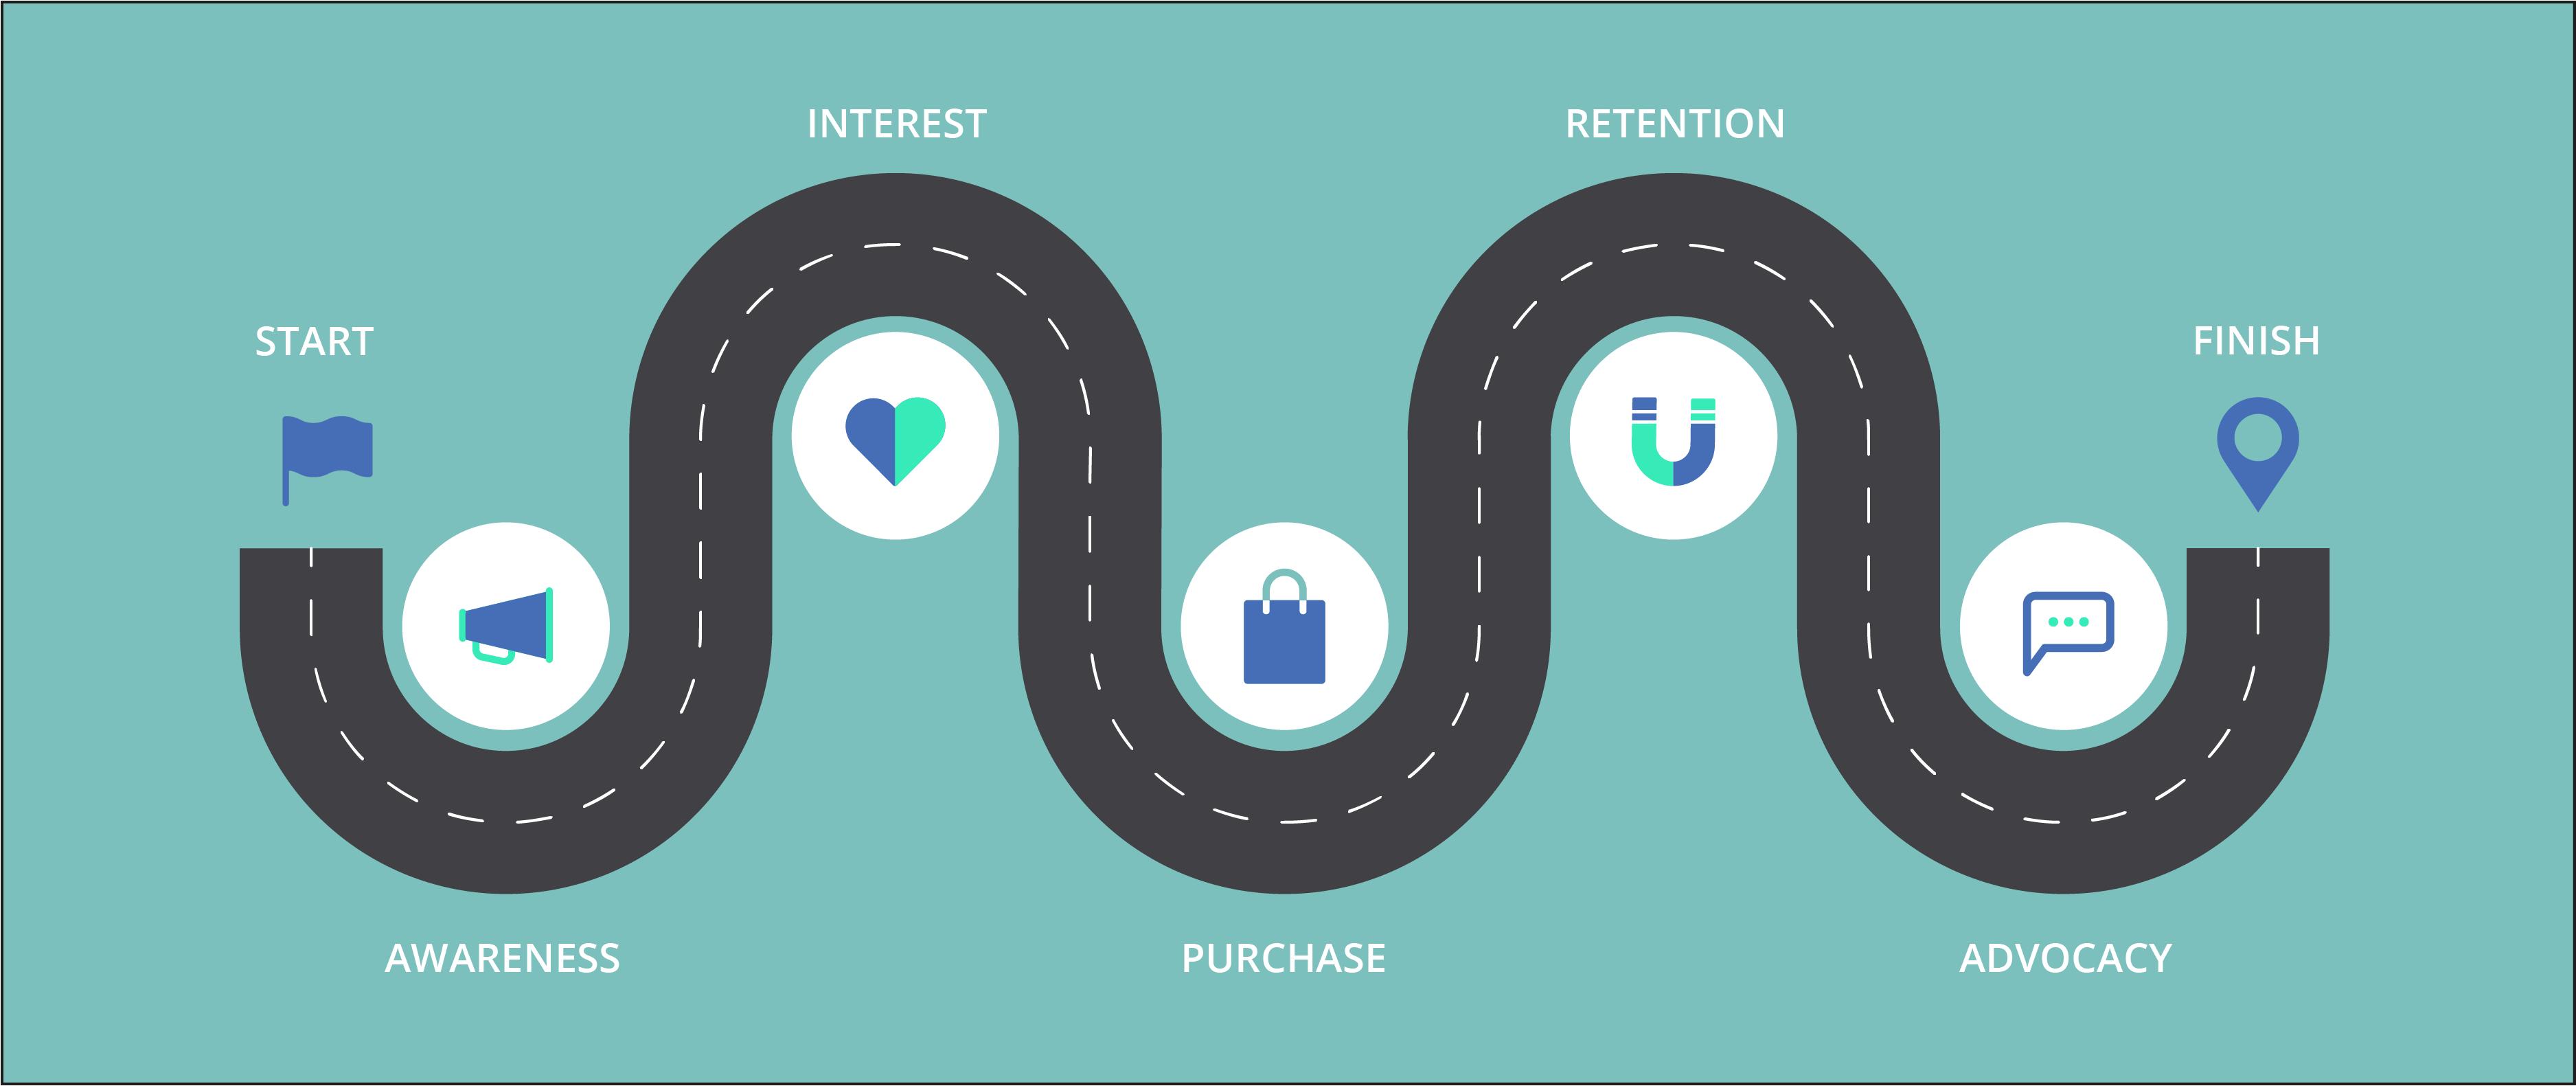 customer journey B2B e-commerce academy